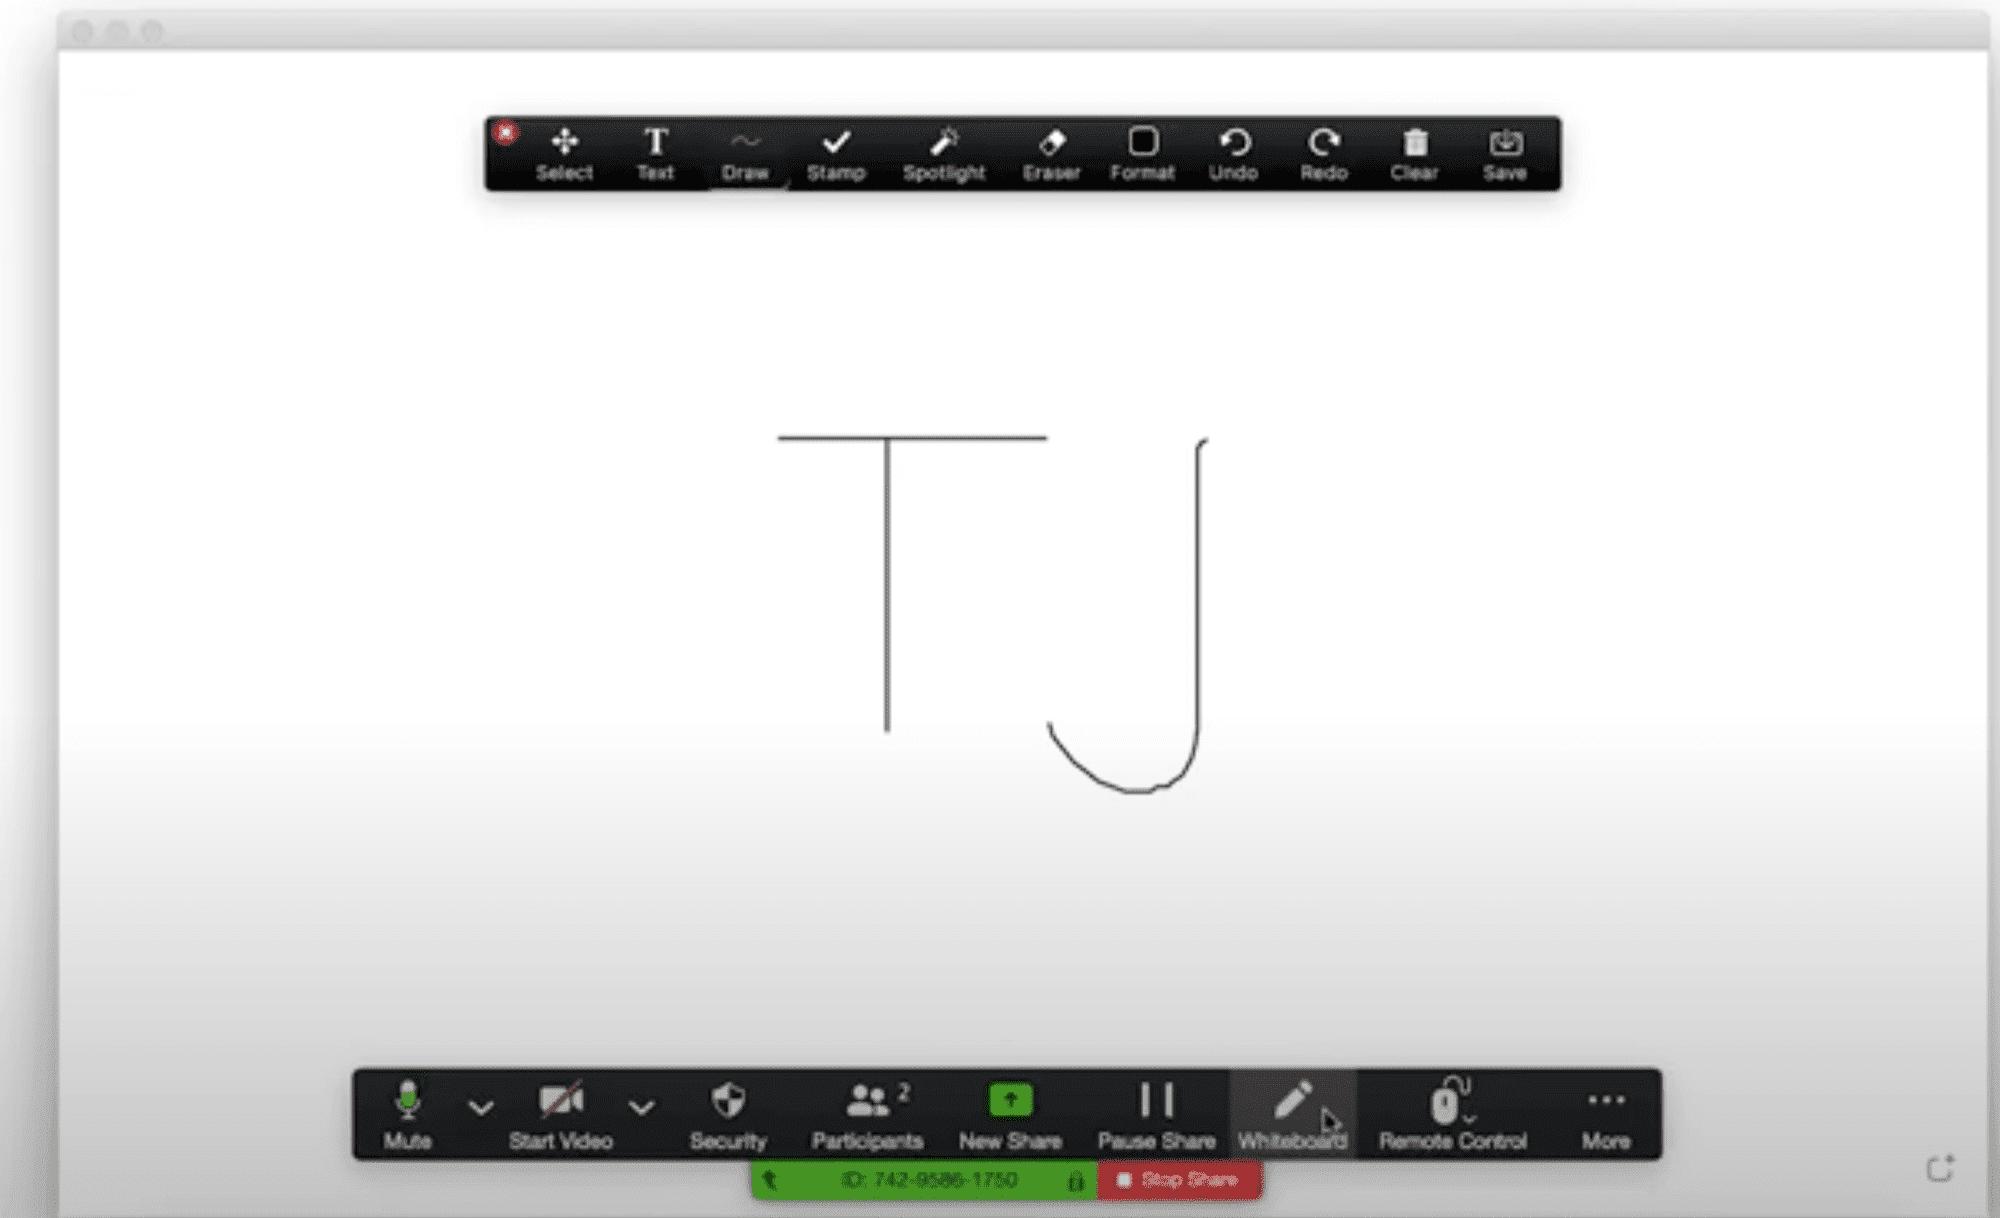 Zoom whiteboard tool